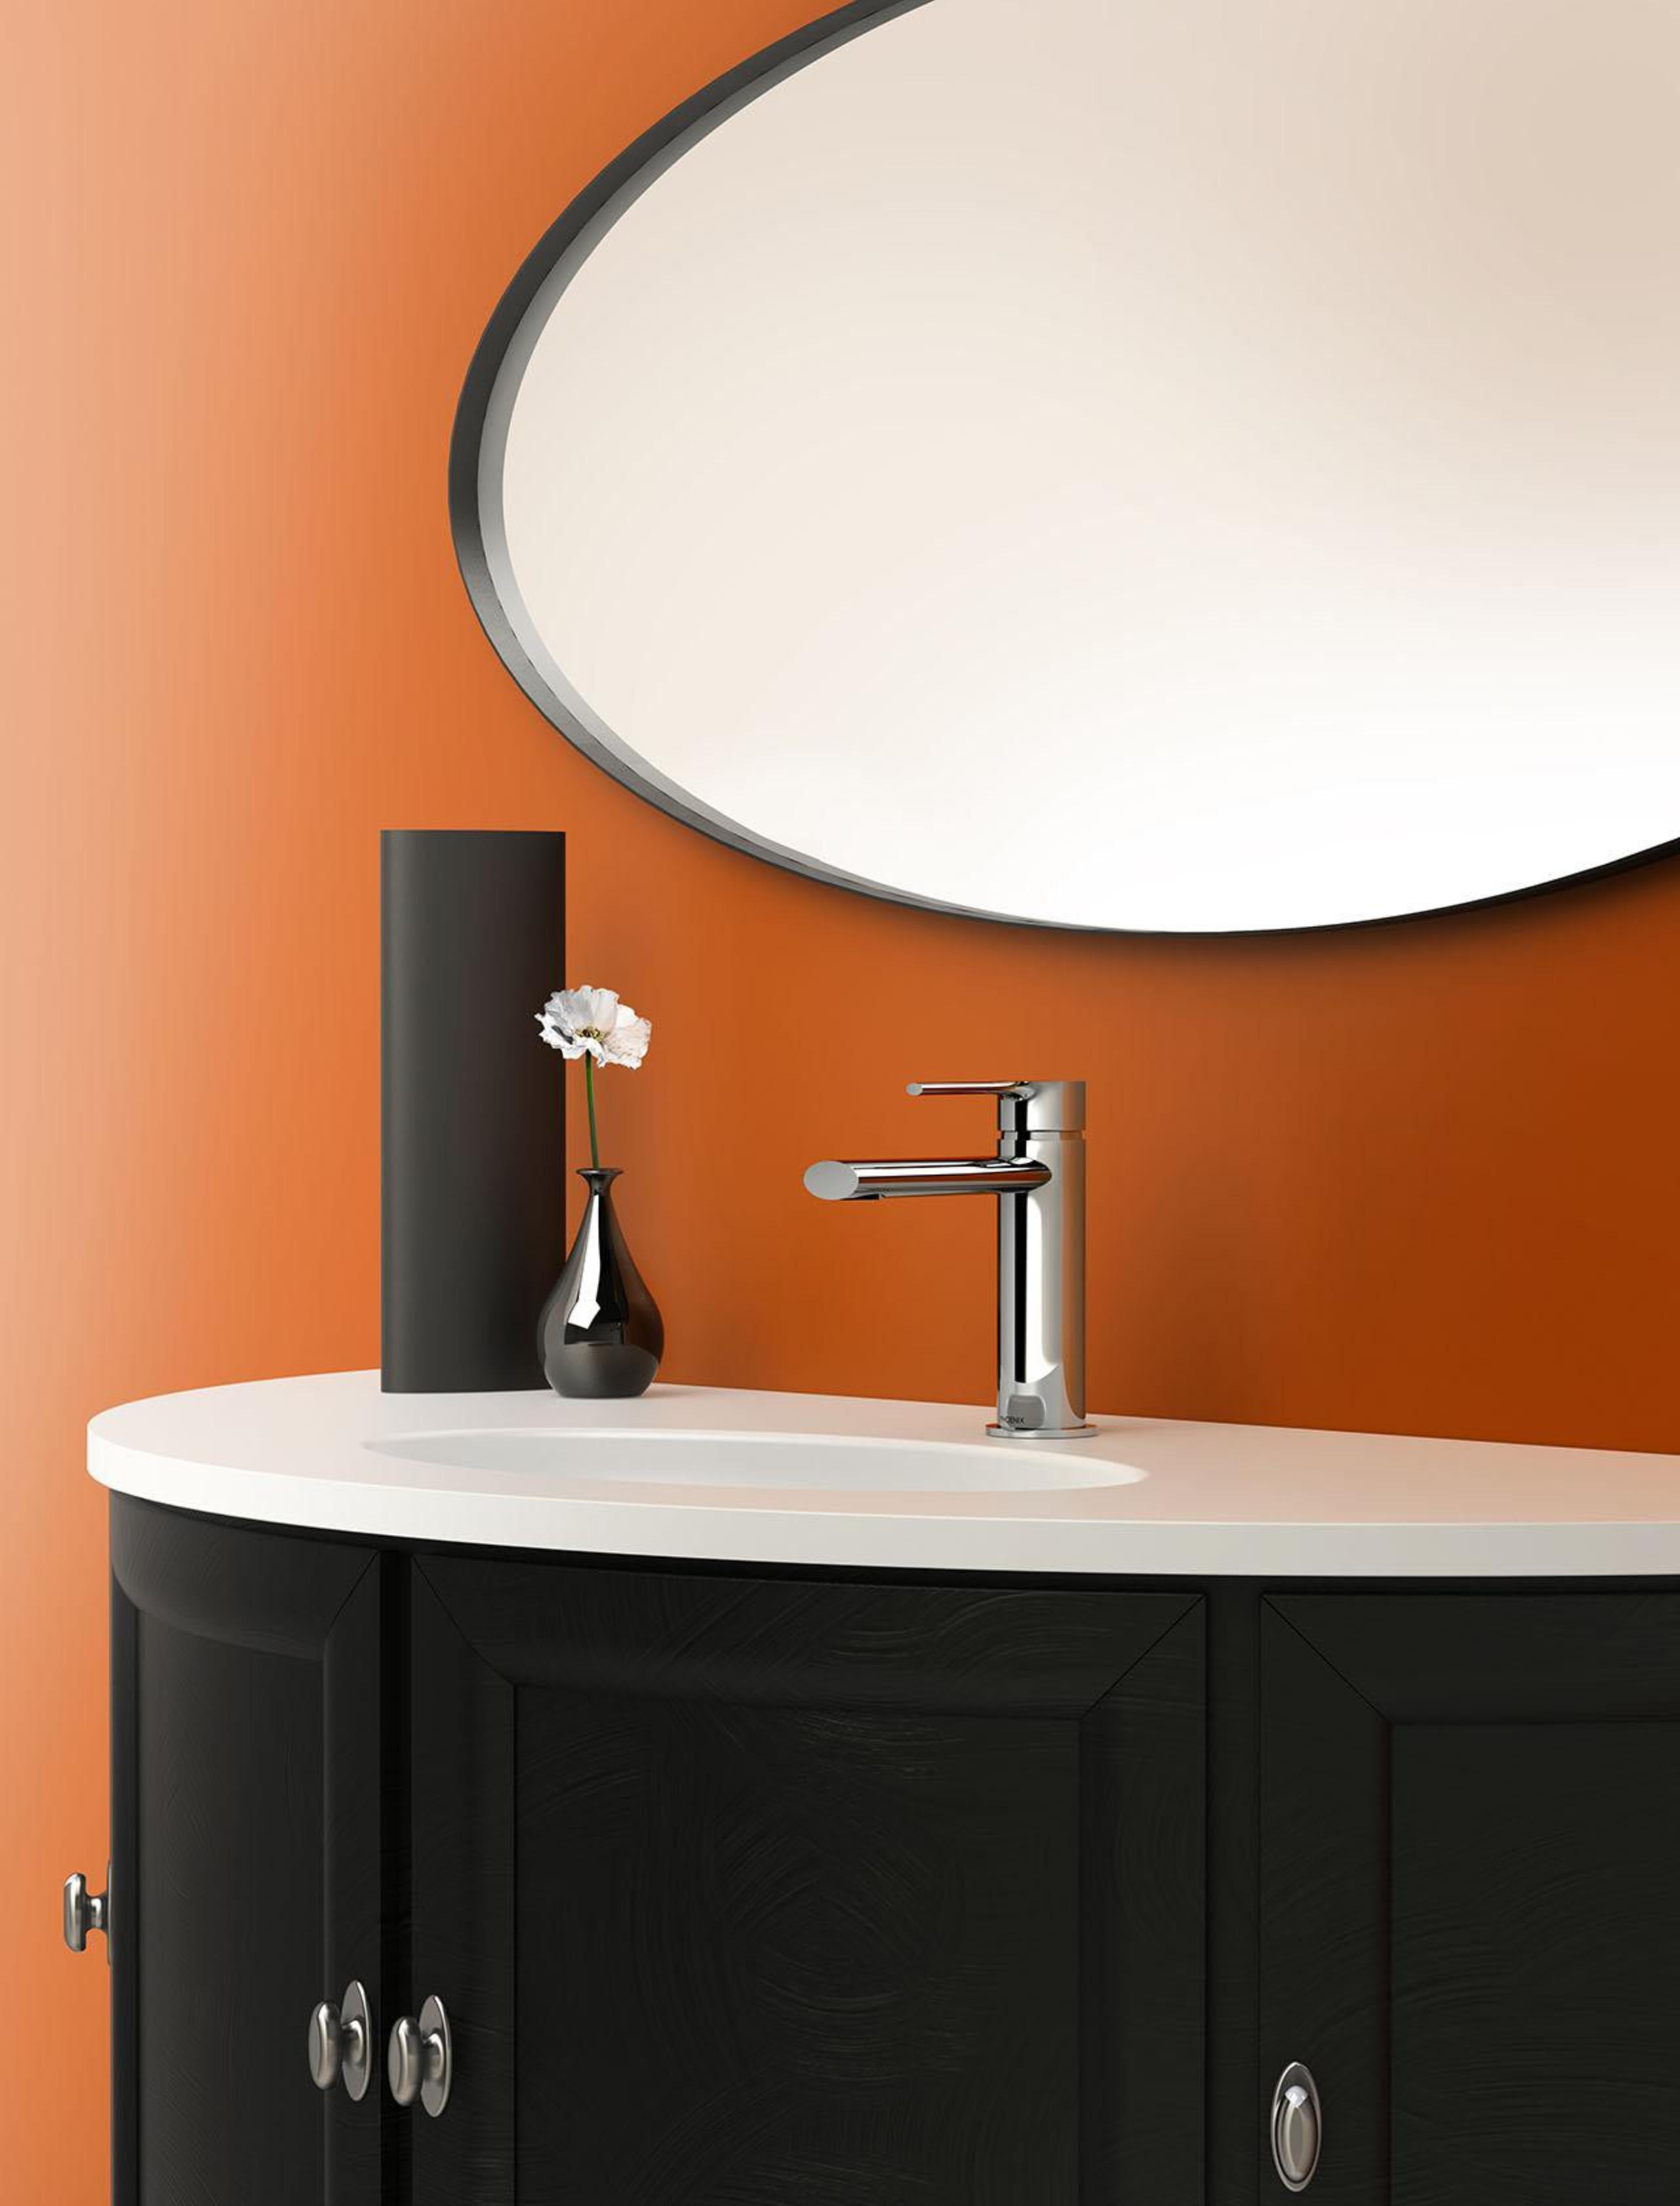 vivid slimline - Our Product - angle   angle, bathroom, bathroom accessory, bathroom cabinet, bathroom sink, furniture, interior design, orange, plumbing fixture, product, product design, sink, tap, white, black